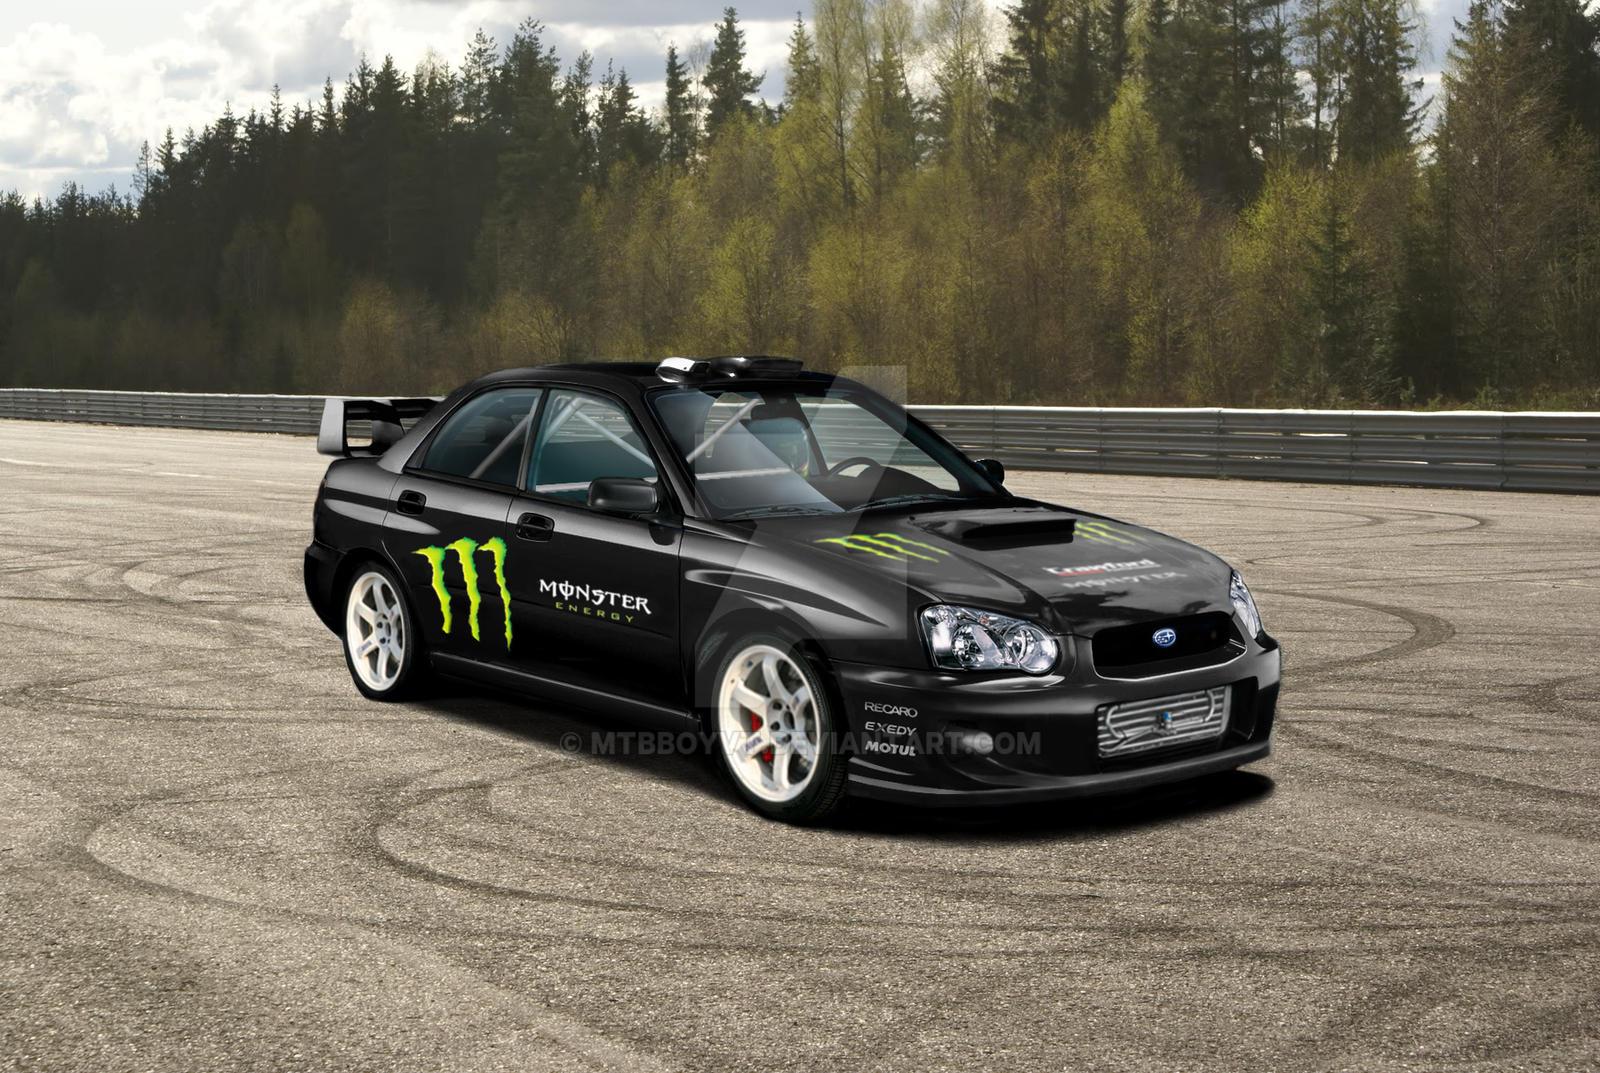 ... Subaru Impreza Monster Energy Rally Cross Wip By Mtbboyvt